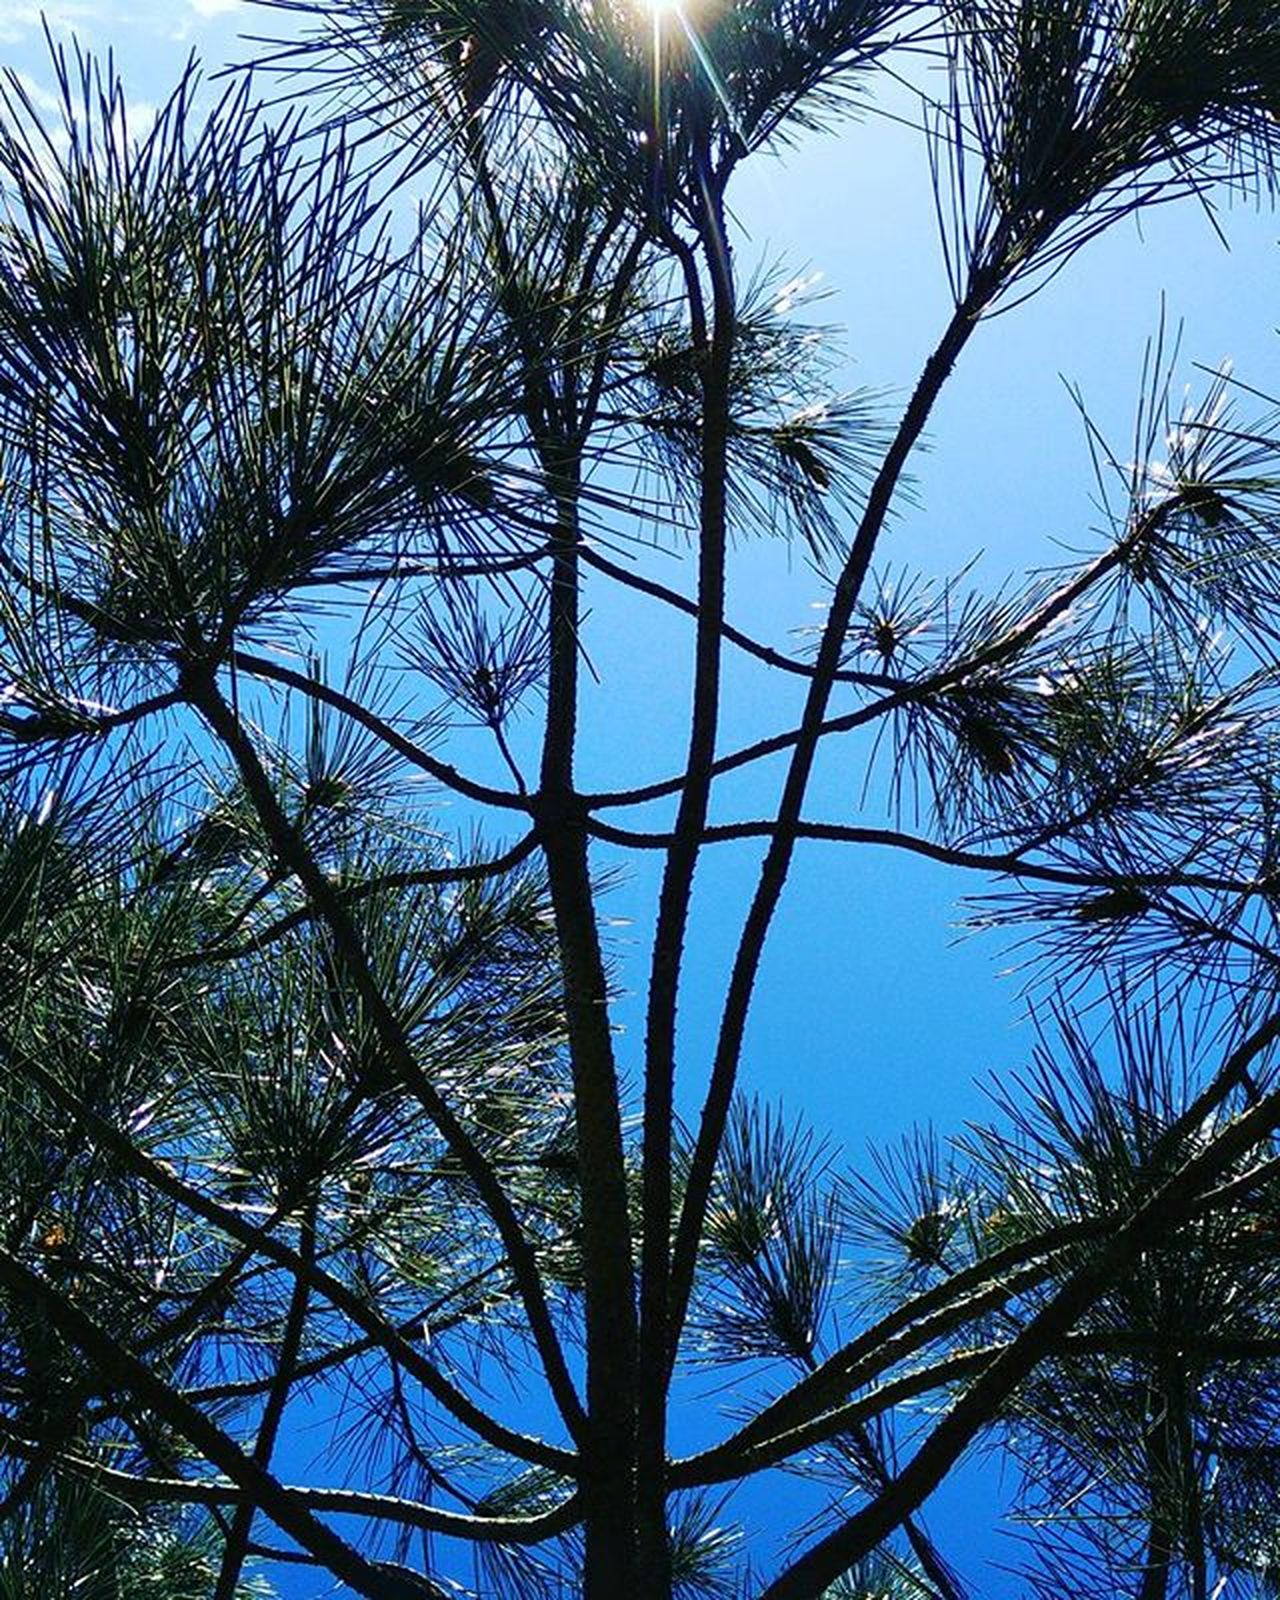 Pinetree@Spring. Naturalworld Natureperfection Tree Green Blue Sun Sunny Spring Instagram Instadaily Pattern Natura Gardner Garden Instagood Outdoorphotography Outdoors Naturephotography Perfectsquare Pinetree .